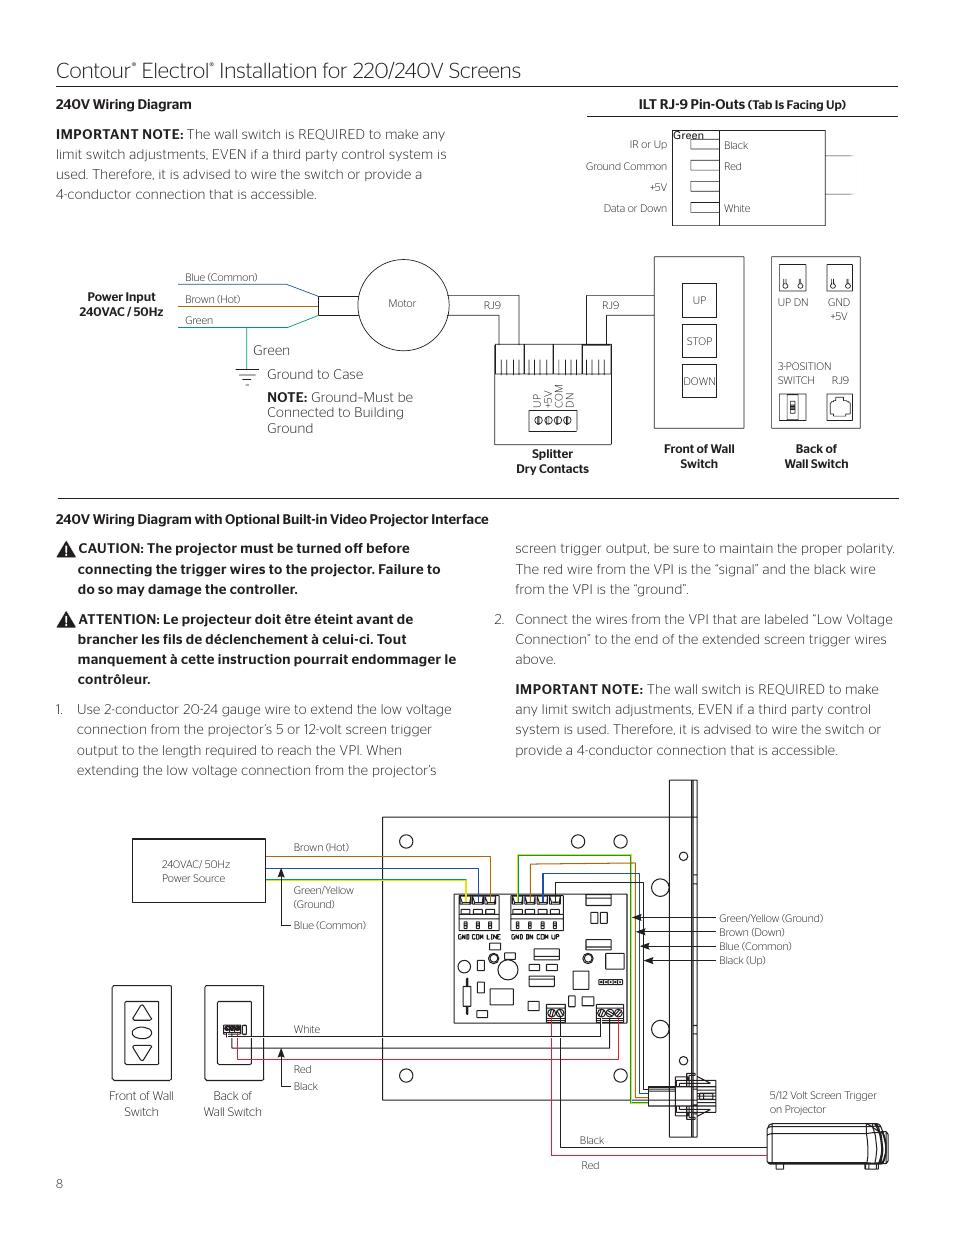 Contour, Electrol | Da-Lite Contour Electrol User Manual | Page 8 / 12